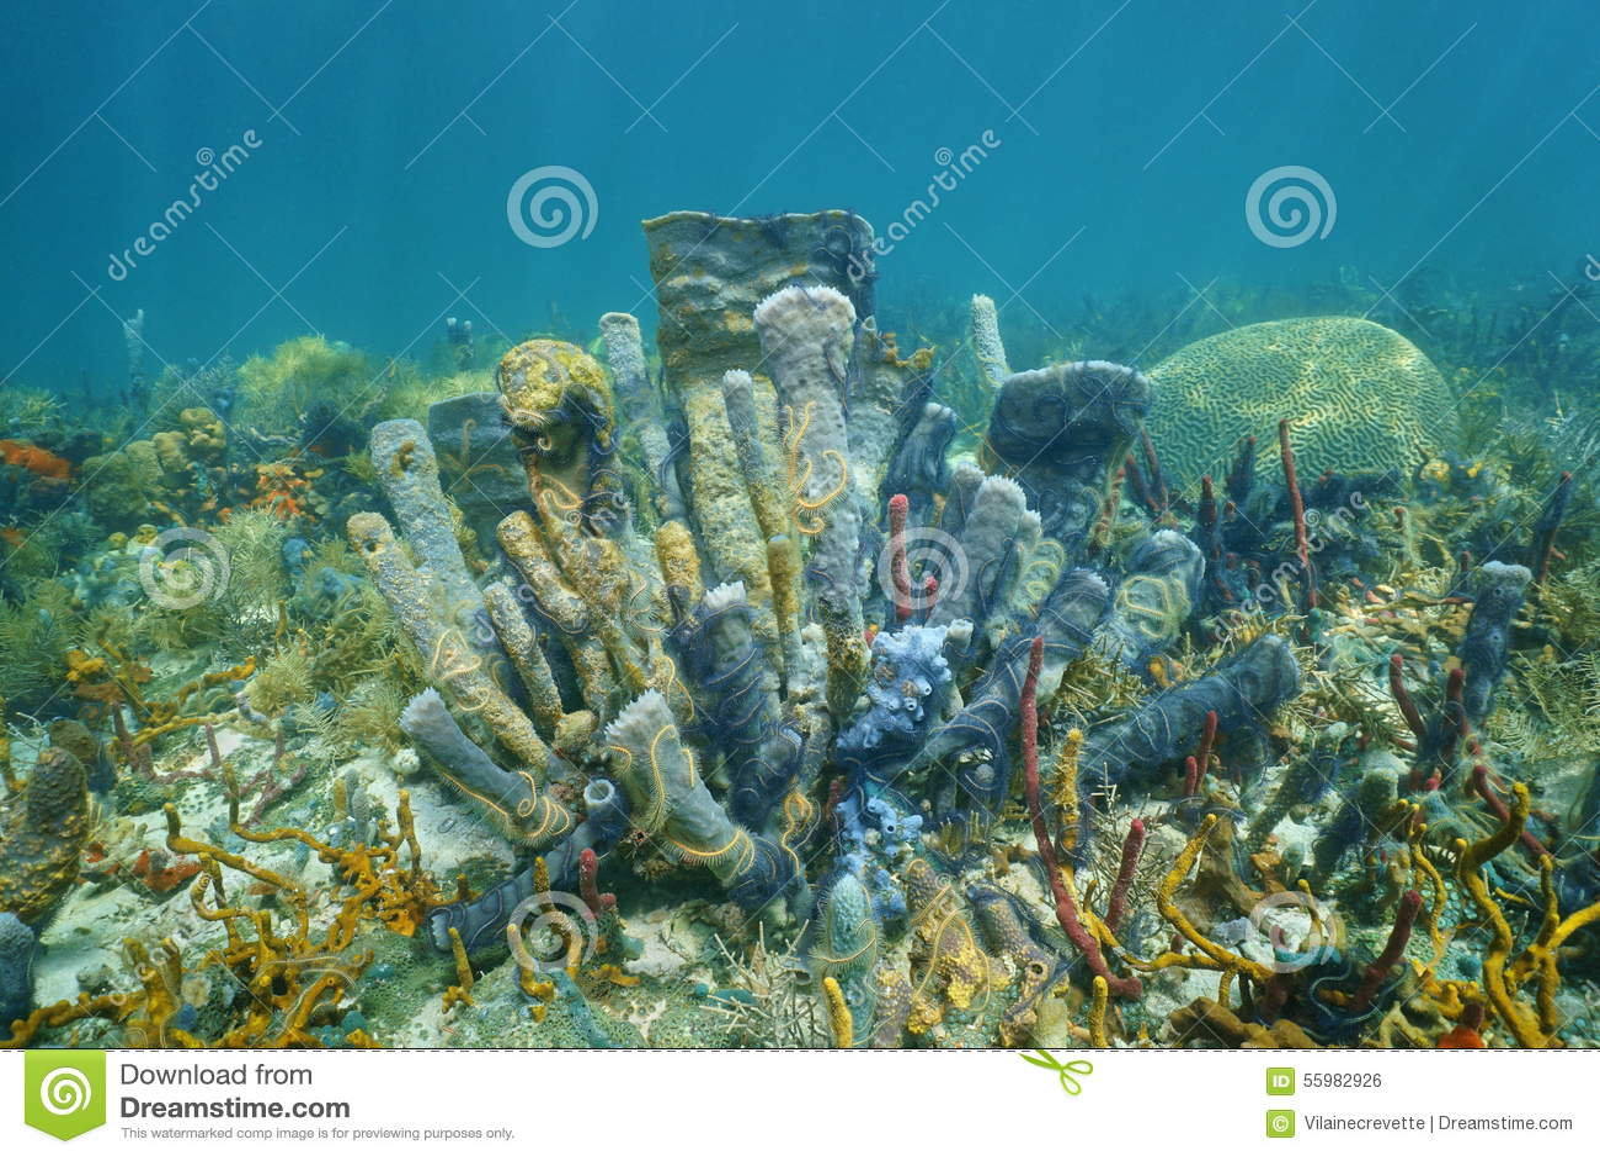 Coral Reef Underwater With Branching Vase Sponge Stock